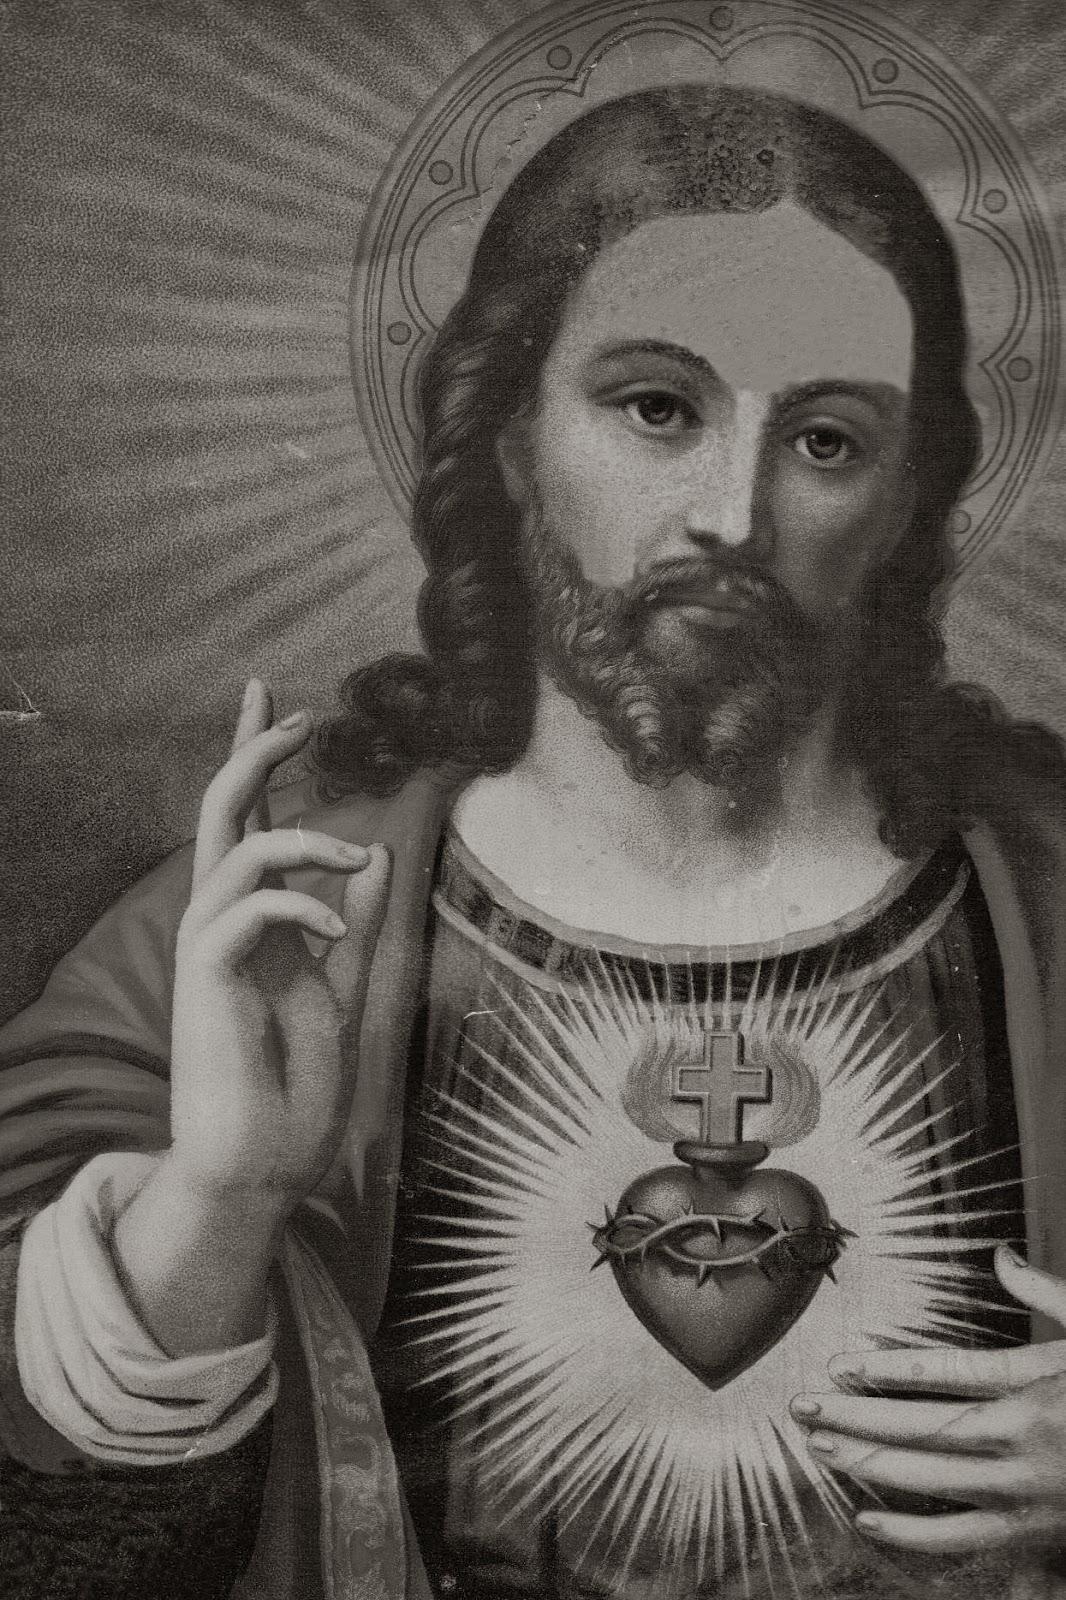 JESUS BLACK AND WHITE